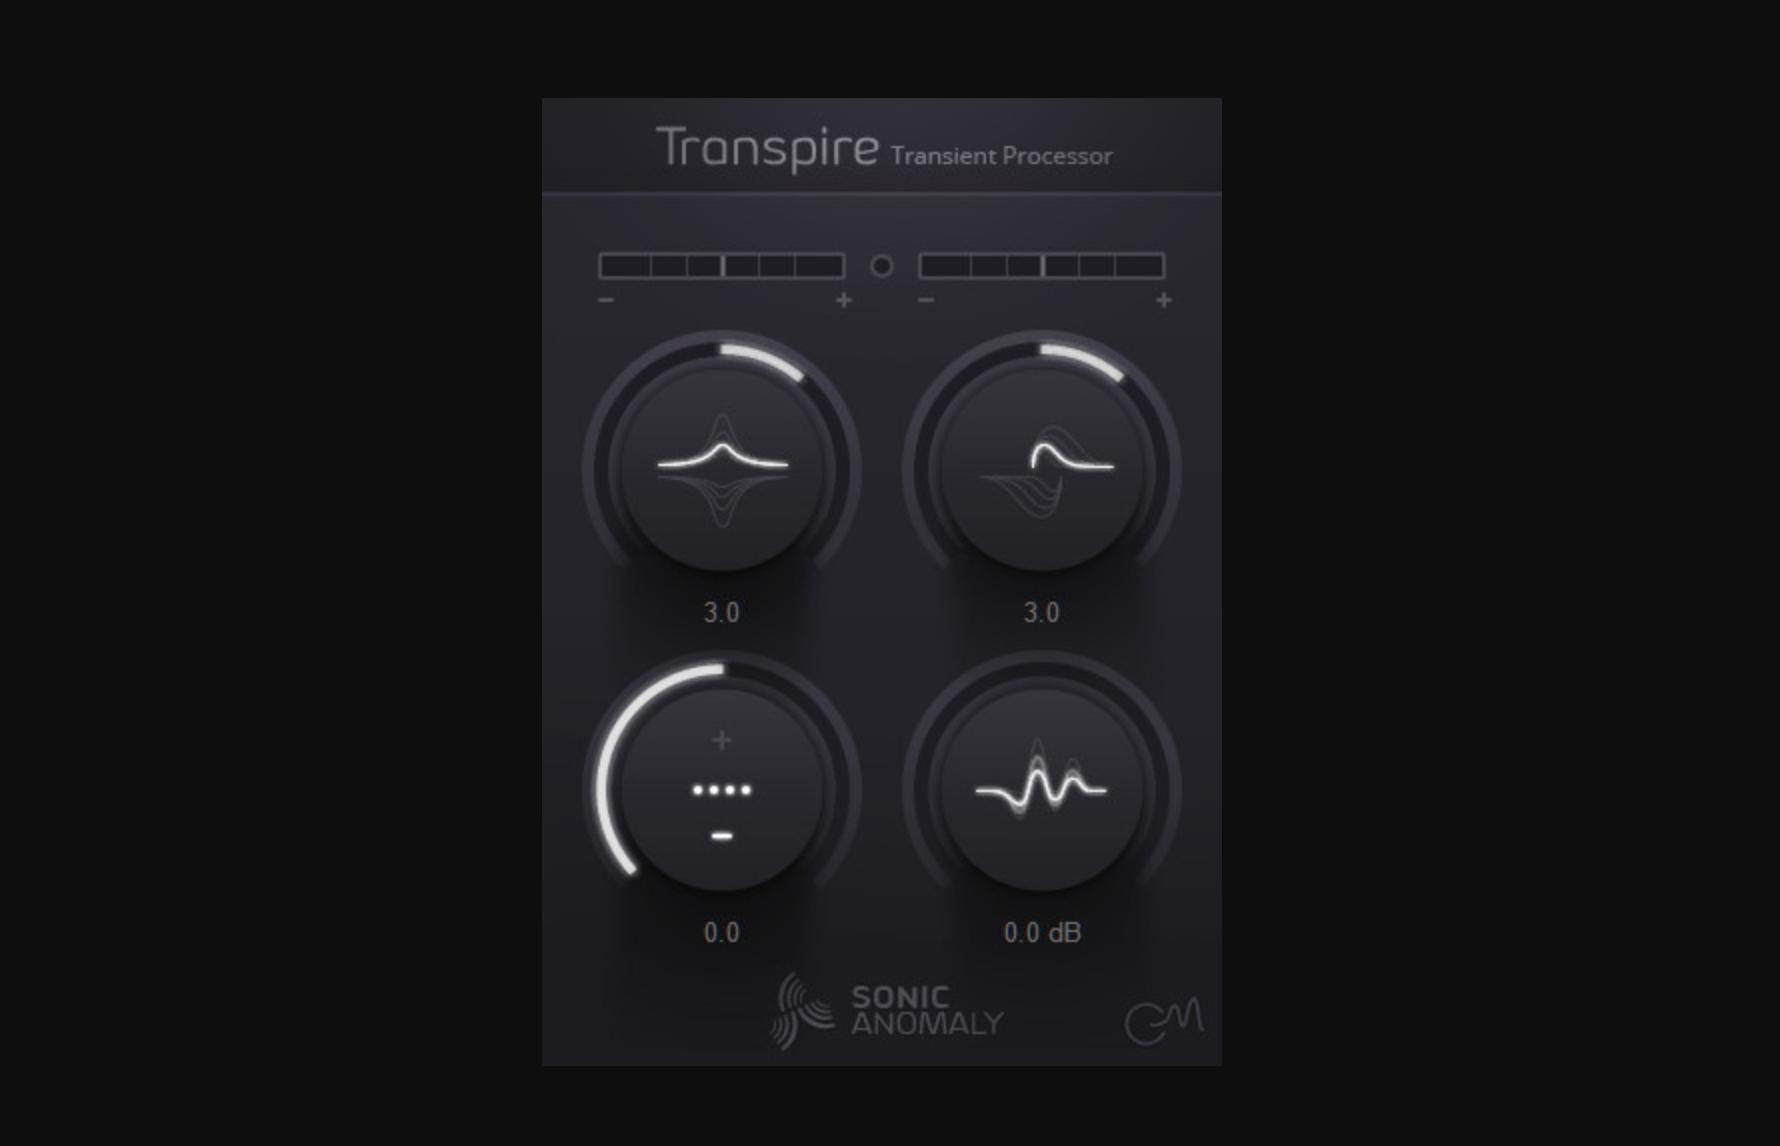 sonic-anomoly-transpire-transient-designer-dbs-music